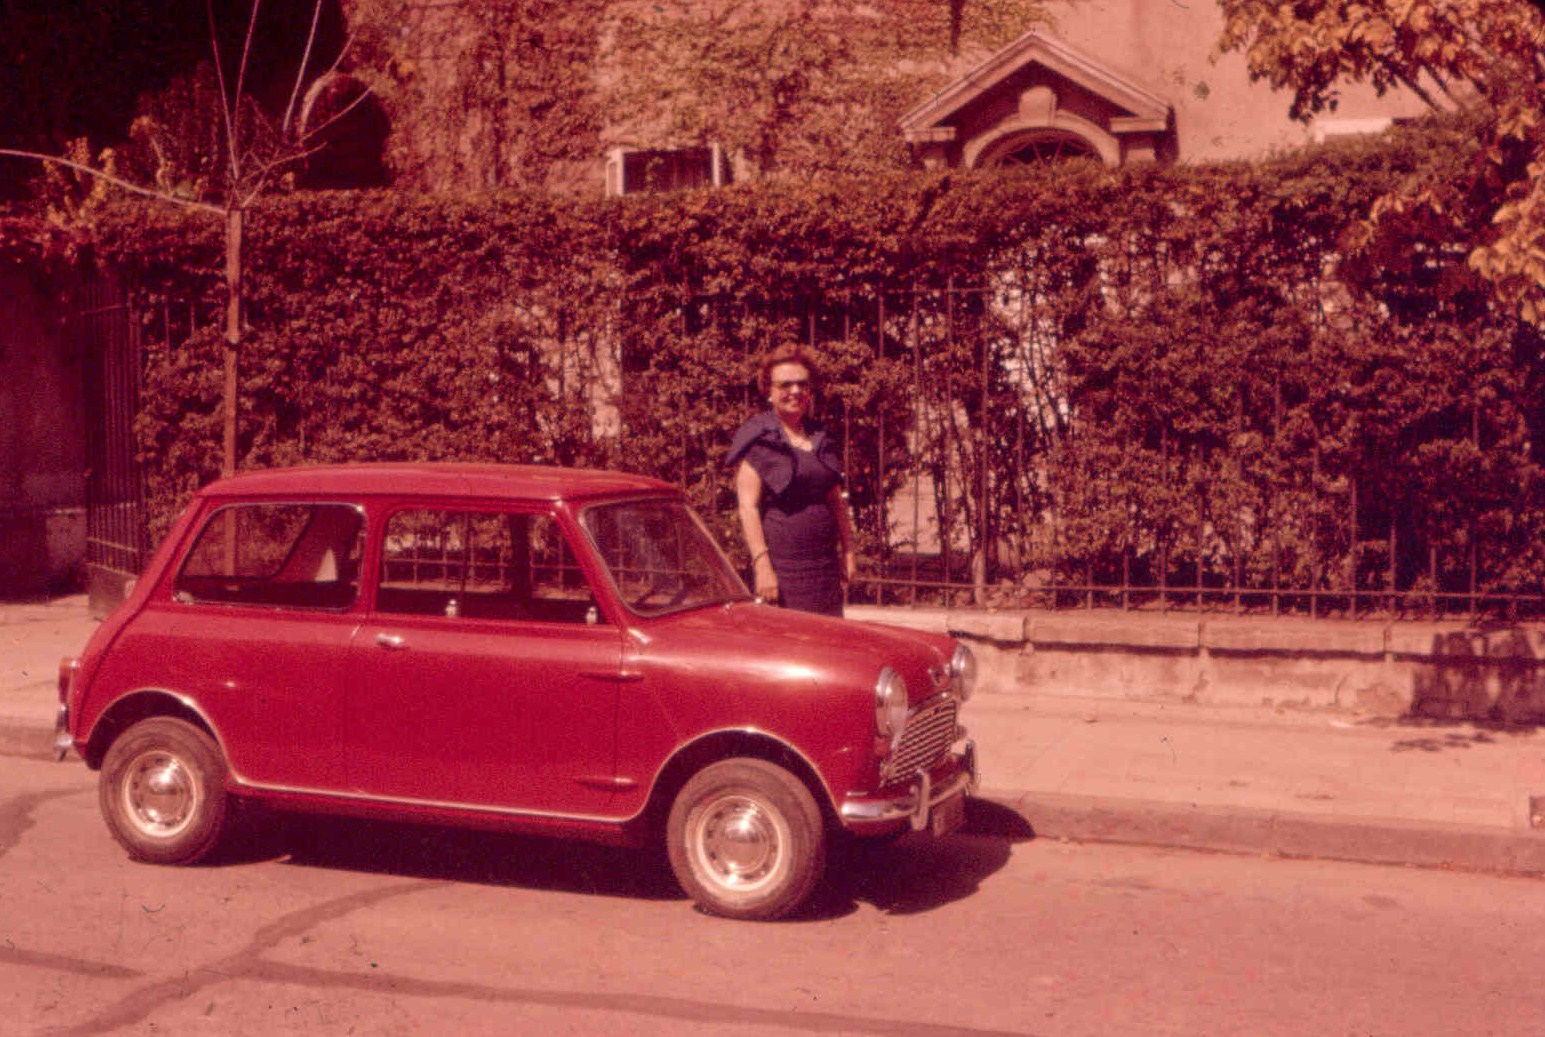 Enterreno - Fotos históricas de chile - fotos antiguas de Chile - Mini en Providencia, 1961